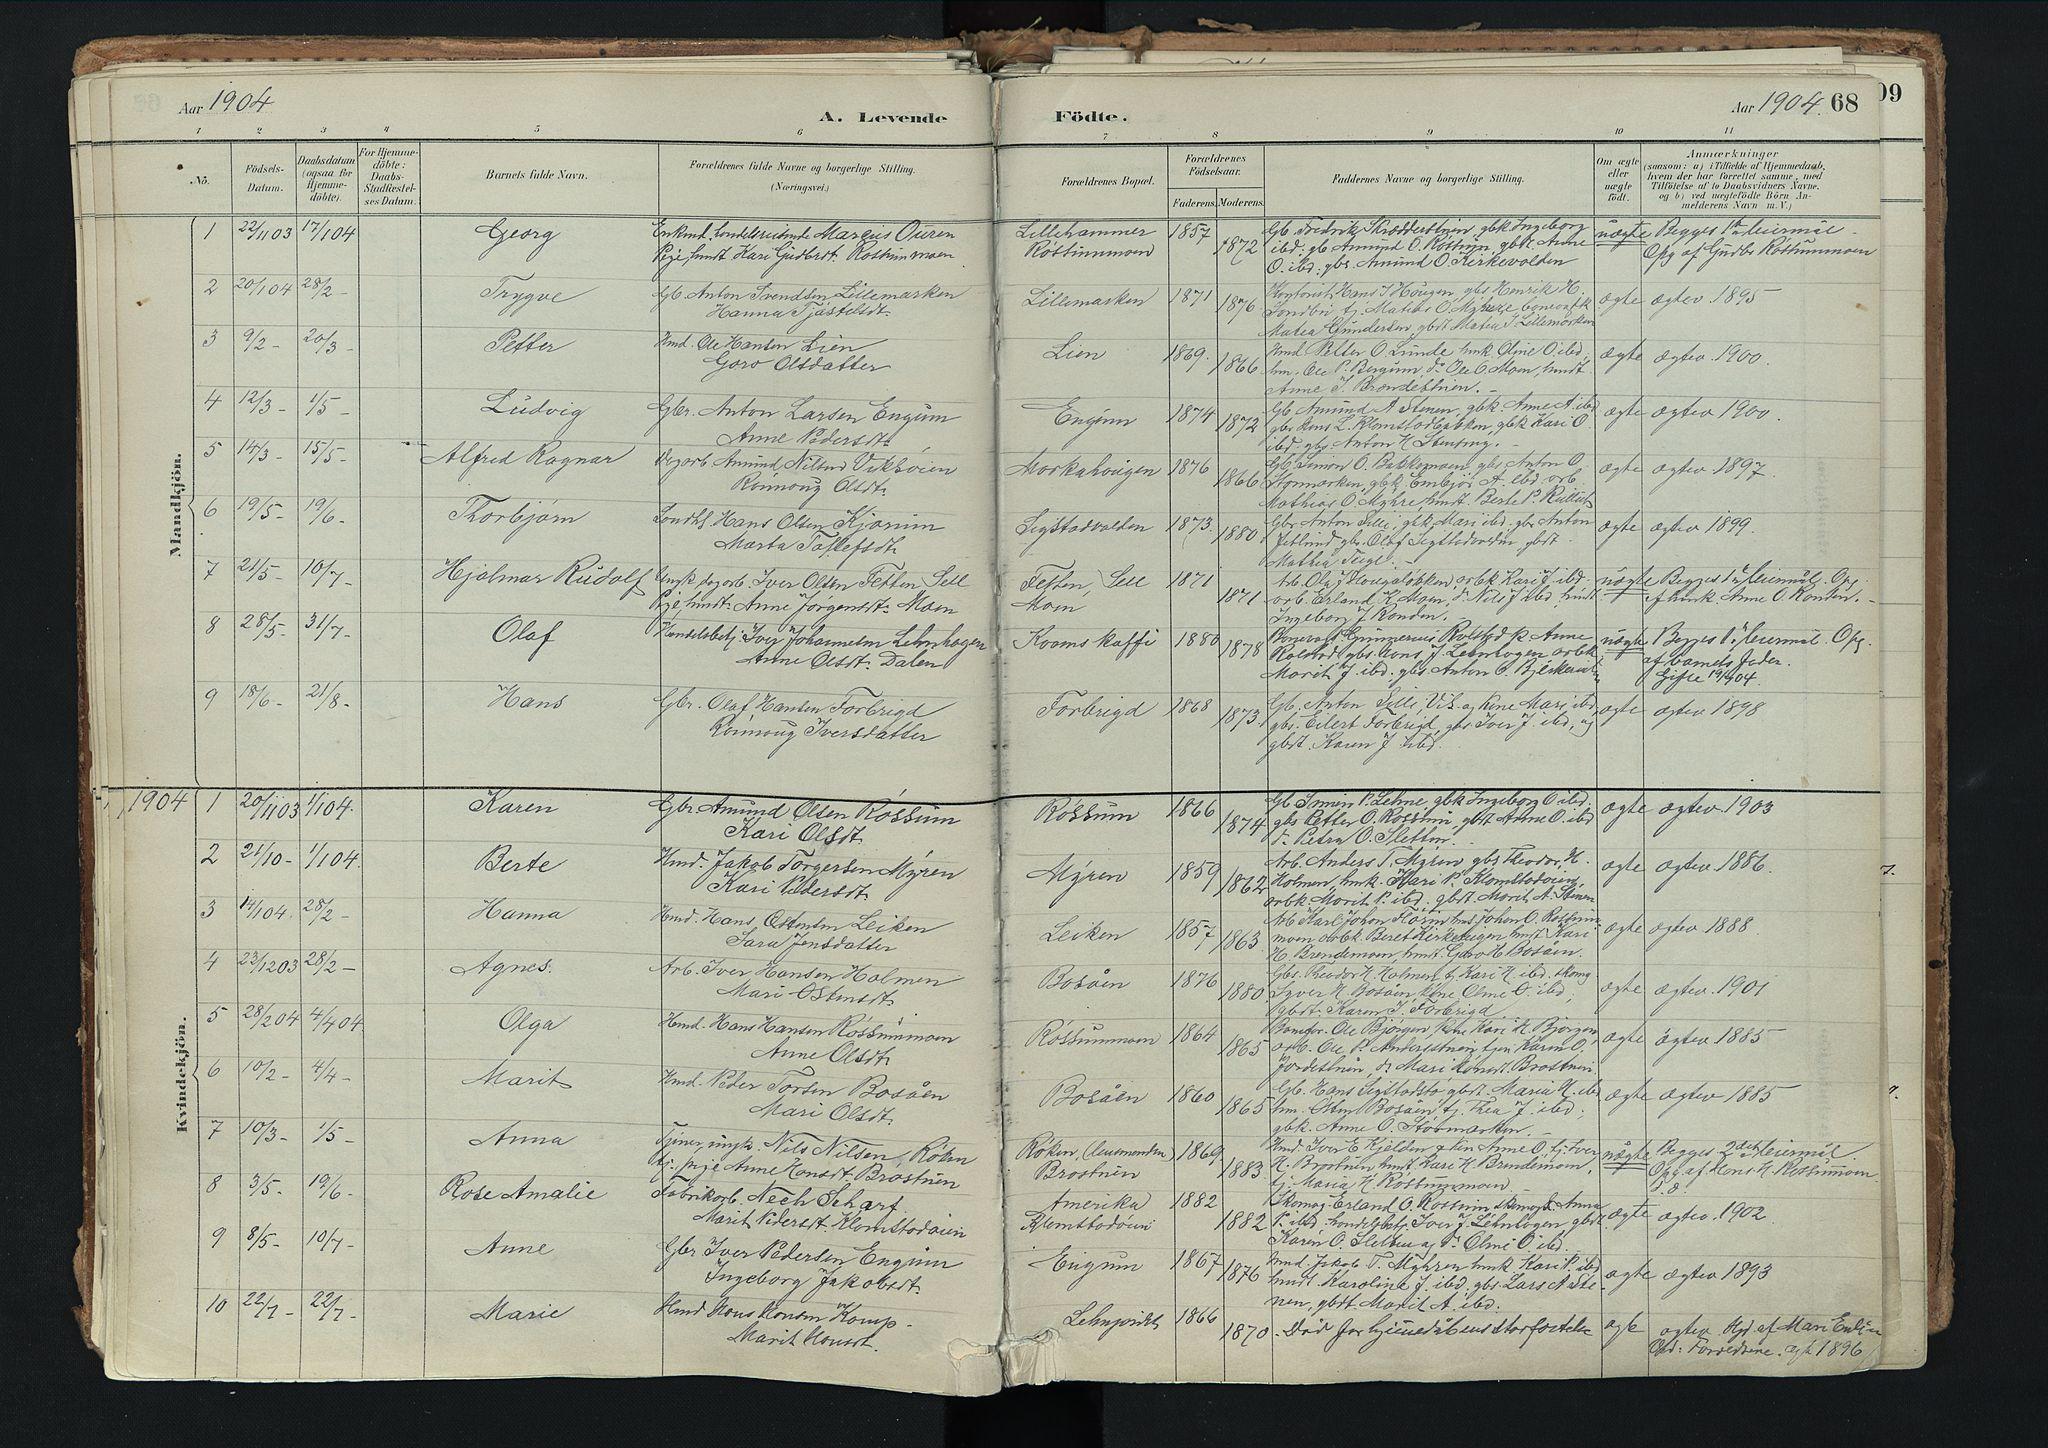 SAH, Nord-Fron prestekontor, Ministerialbok nr. 3, 1884-1914, s. 68